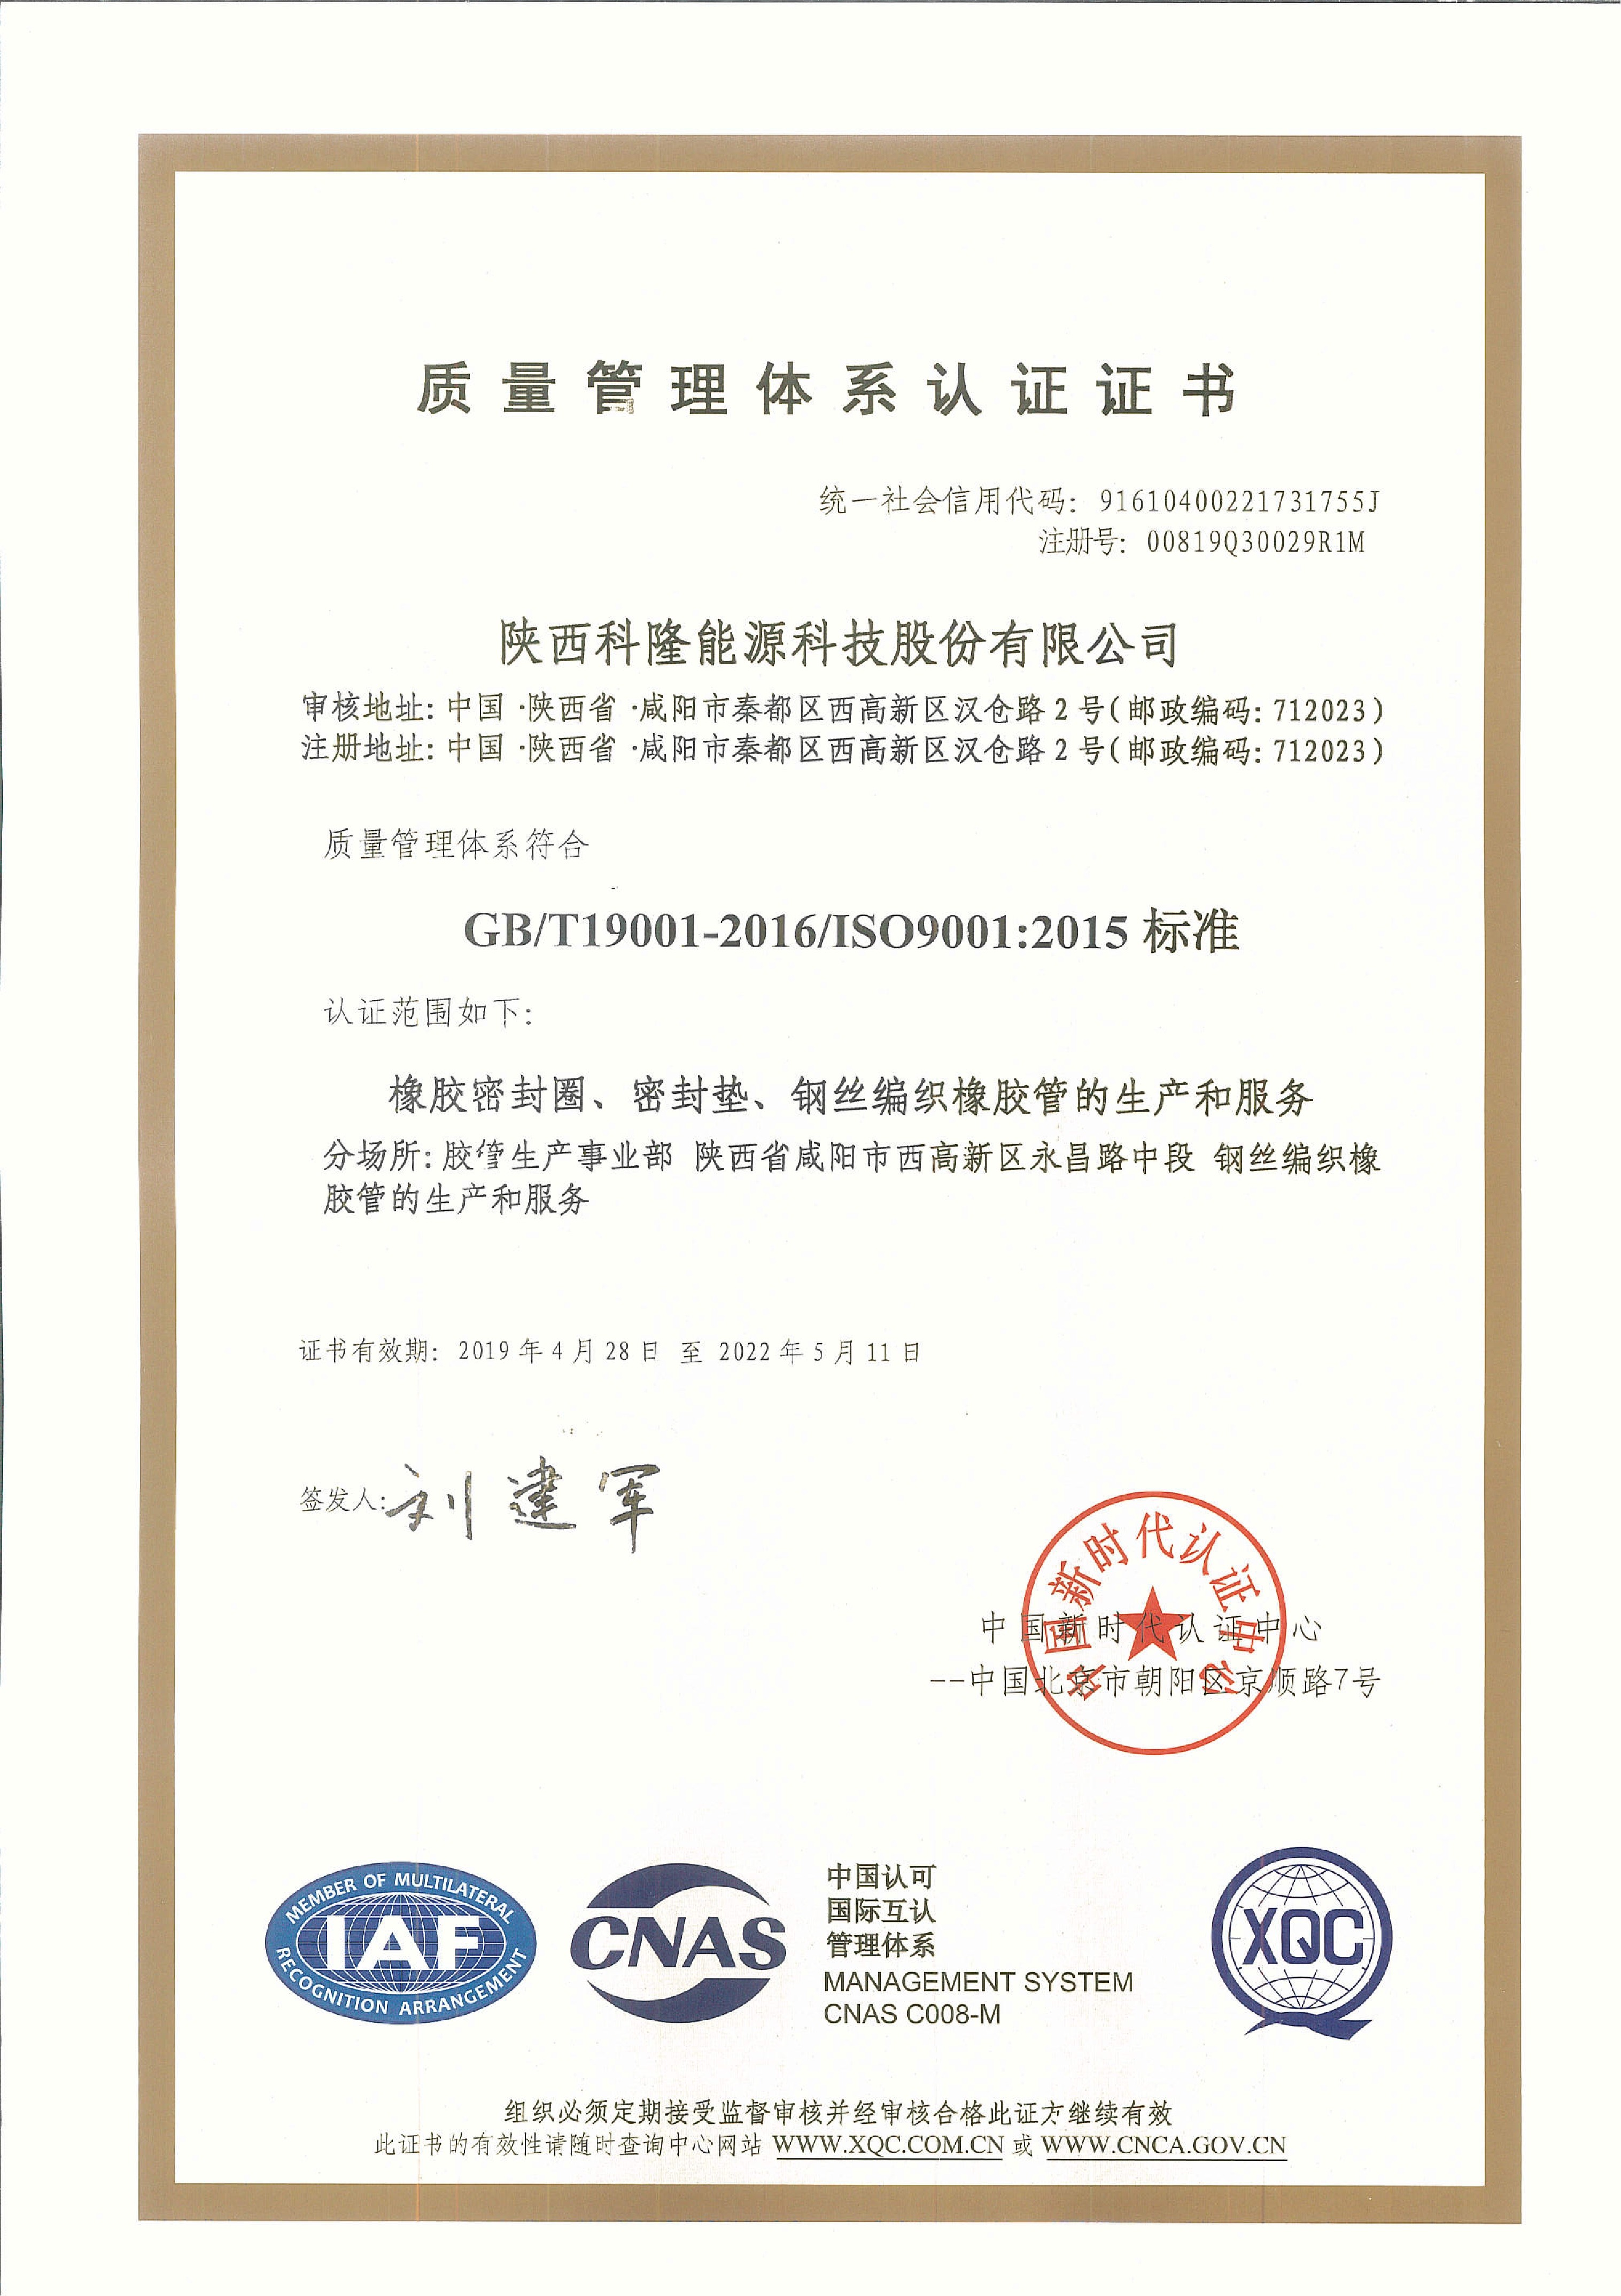 認證-ISO9001:2005認證